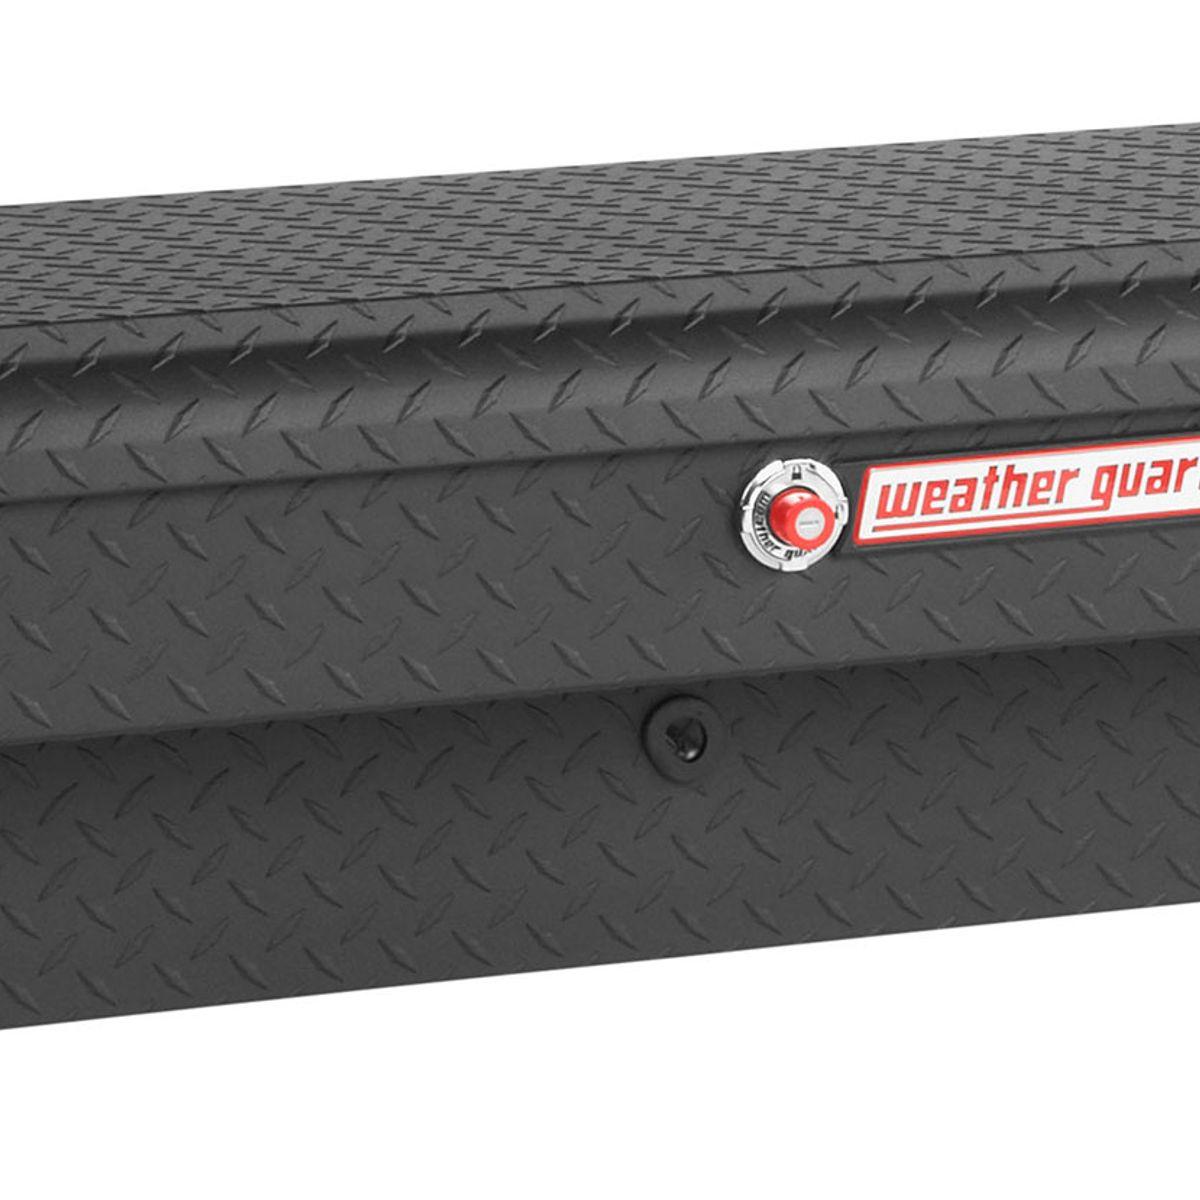 Weather Guard Lo-Side Box  Model 166-3